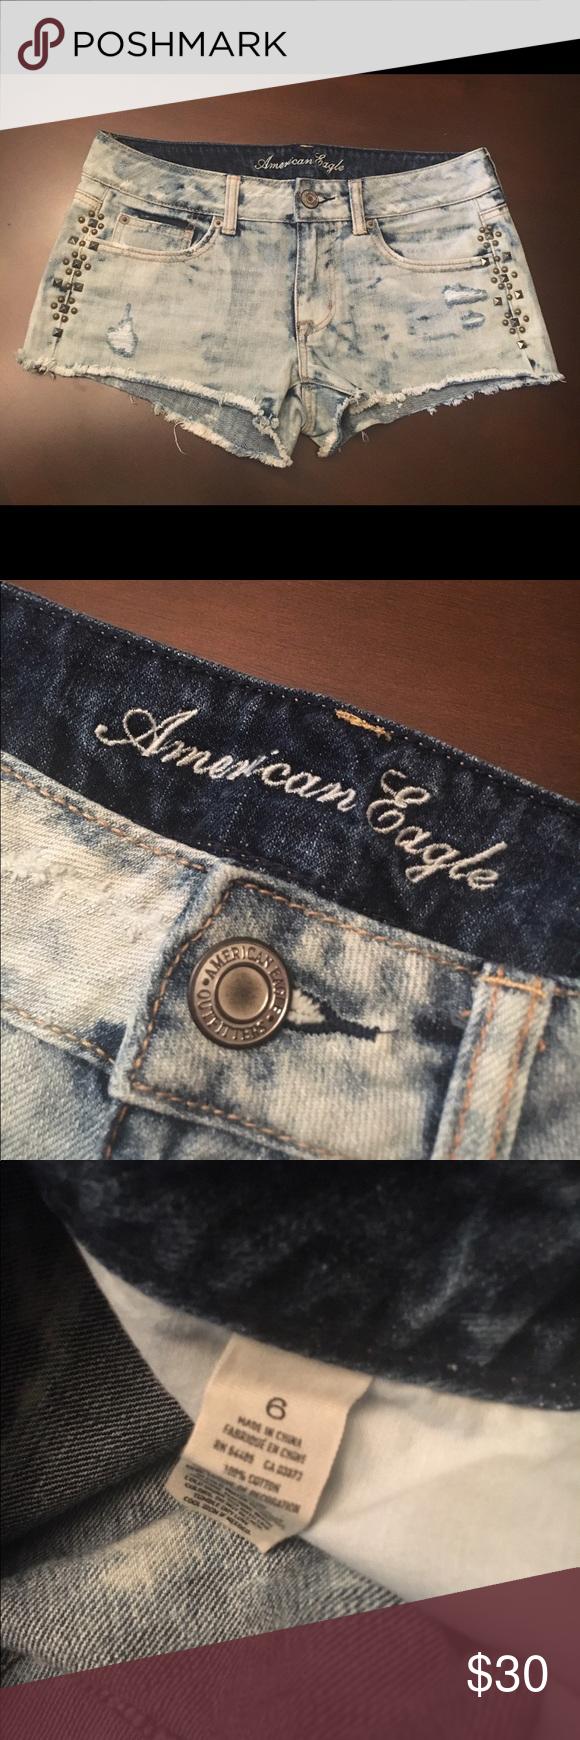 American Eagle Jean Shorts Gorgeous American Eagle Jean